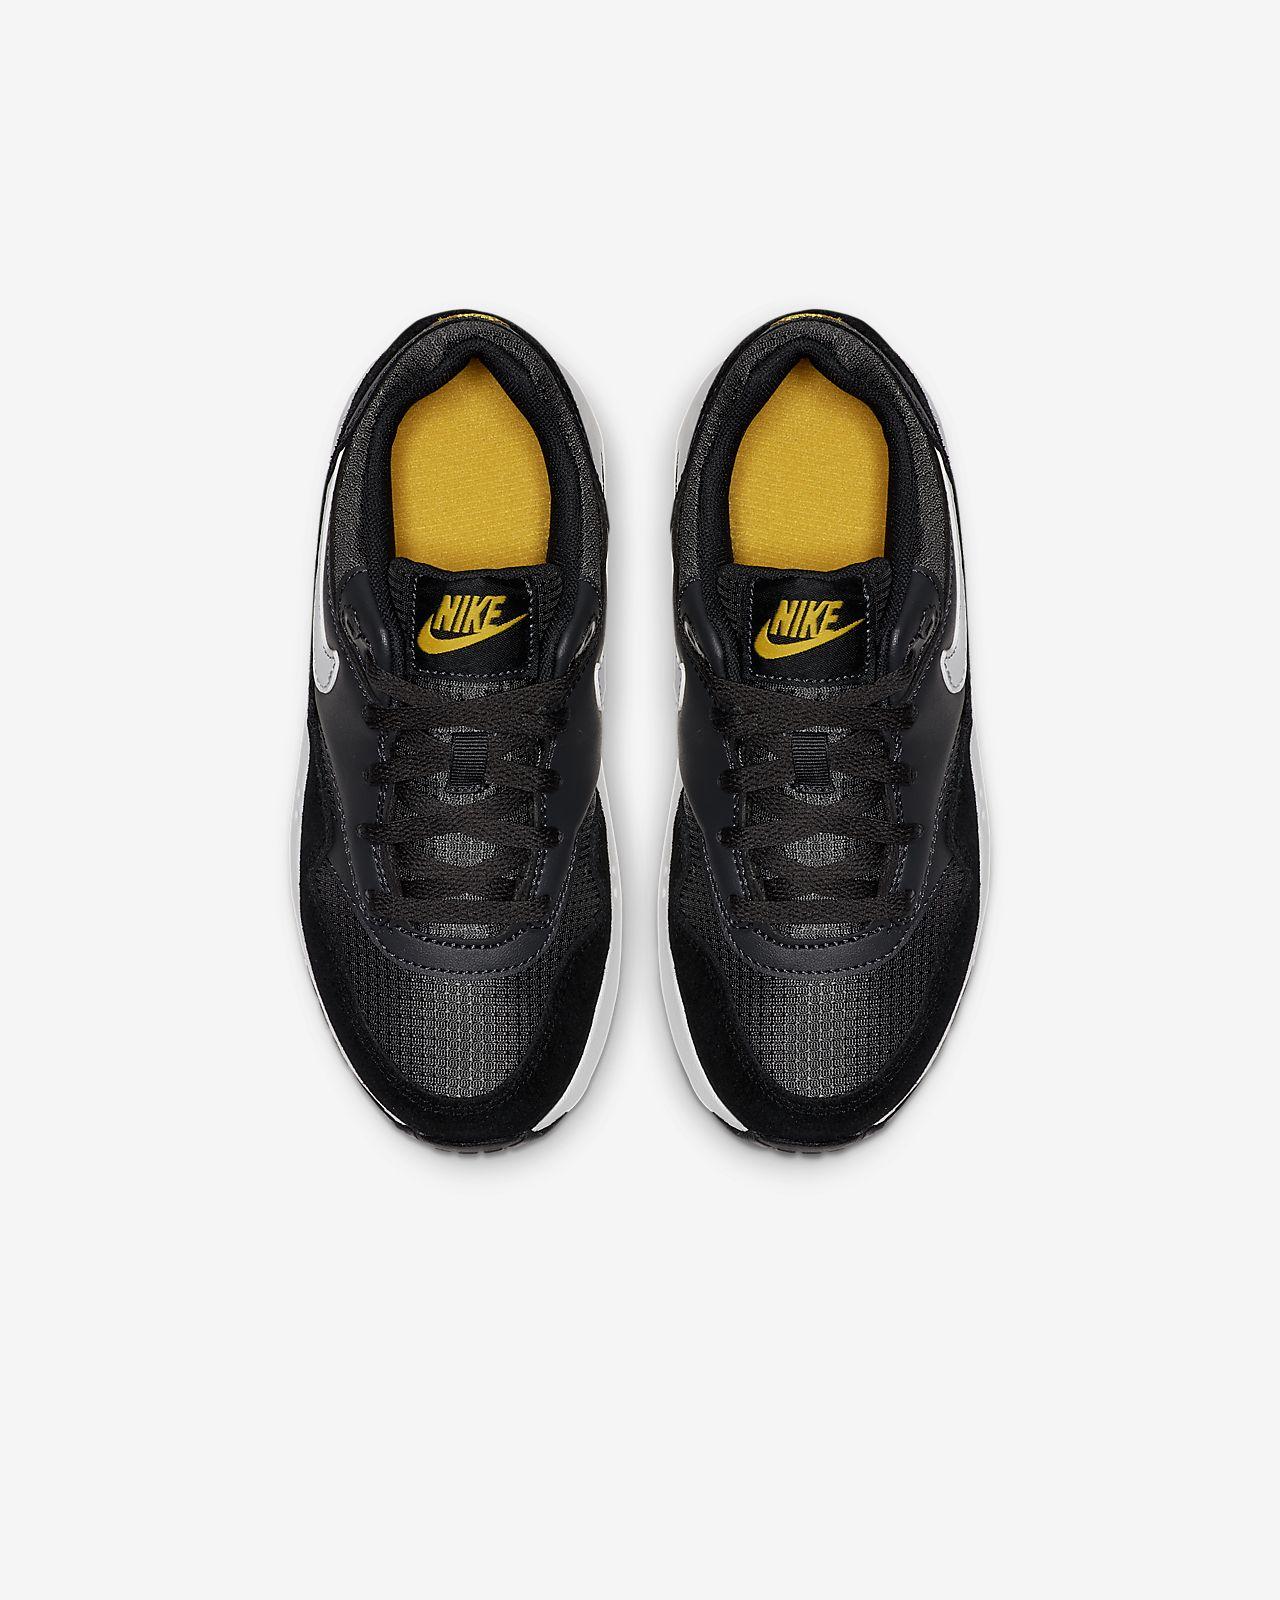 Shoe Air Little Nike Max 1 Kids' kXZOPiuT